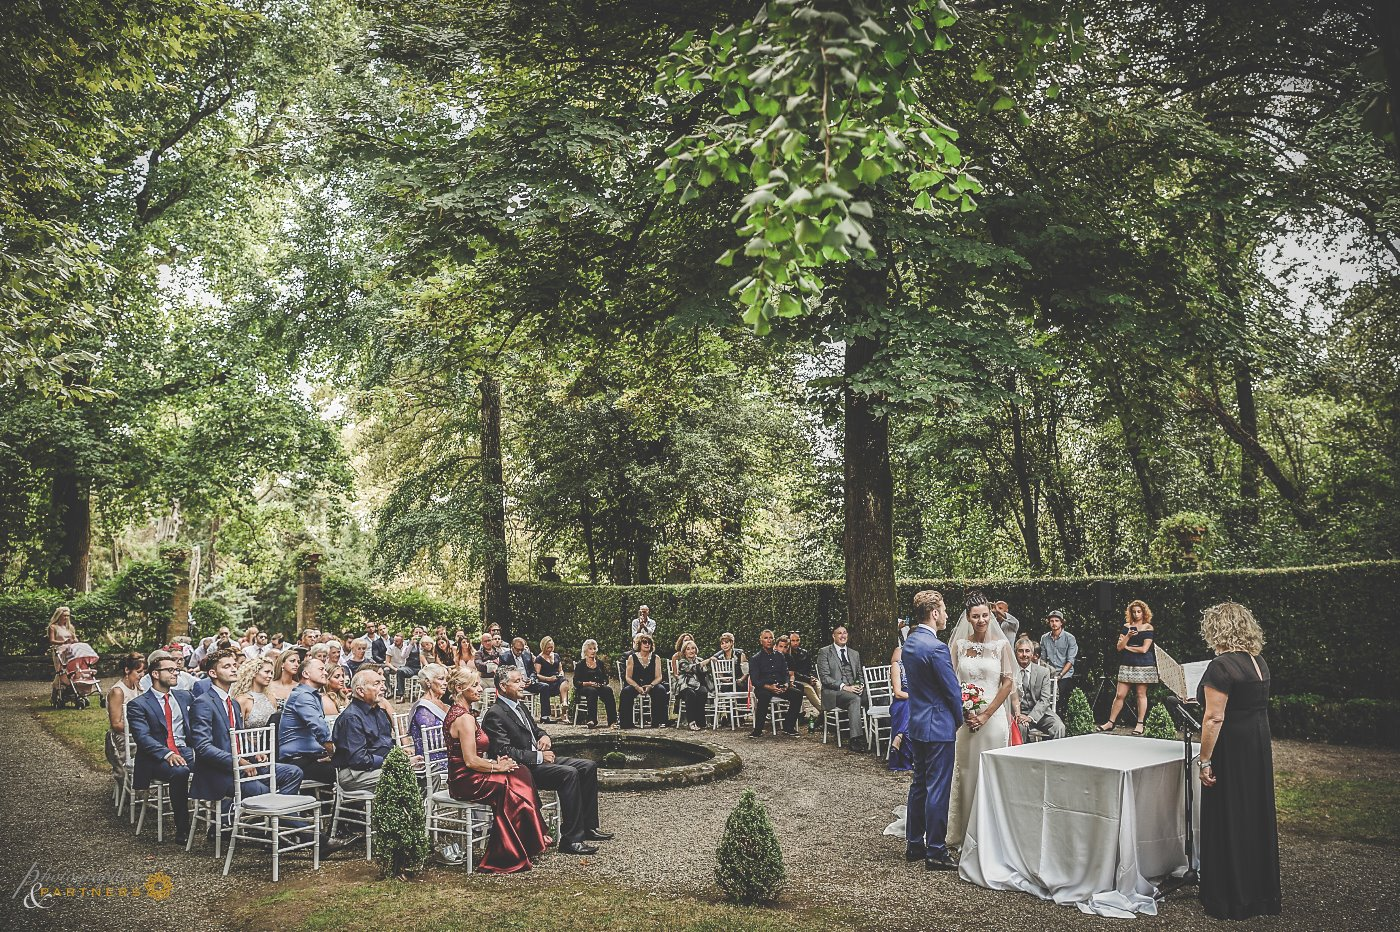 photography_weddings_villa_grabau_05.jpg